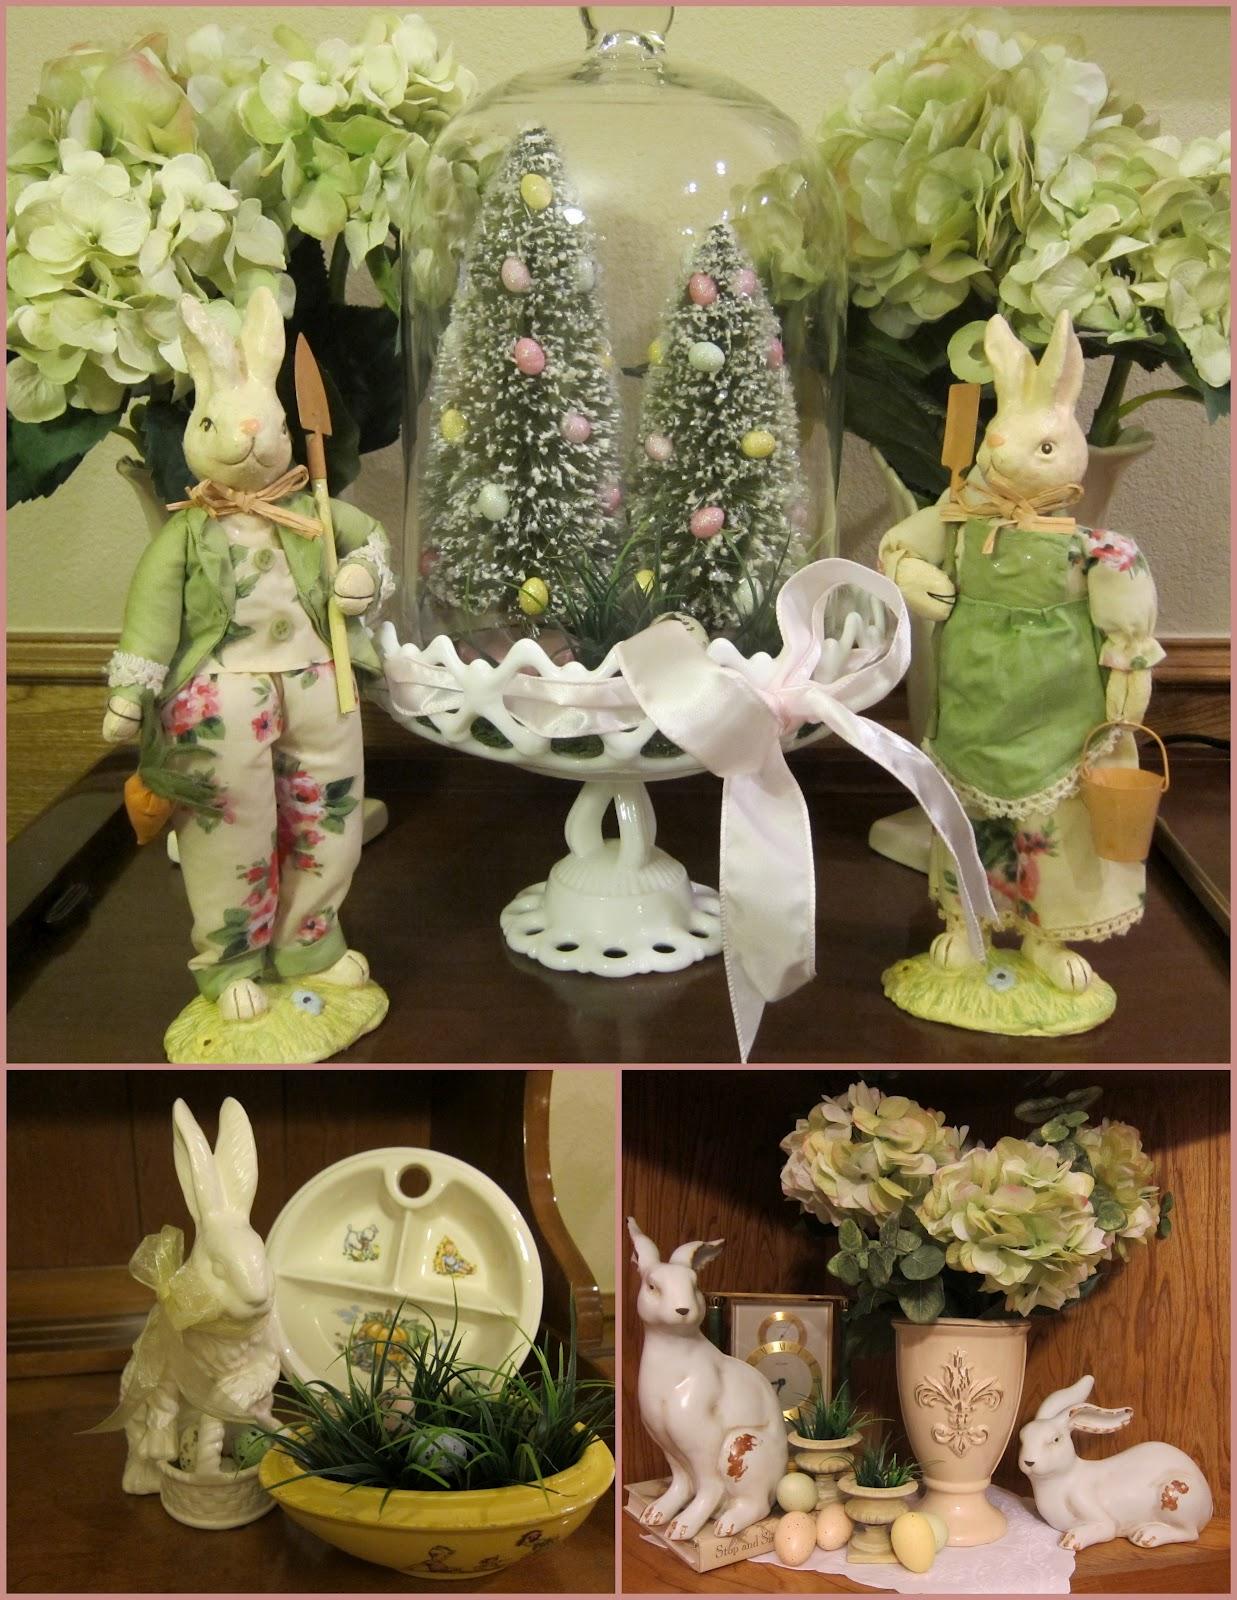 Ladybug Creek: Easter Decorating - Done!